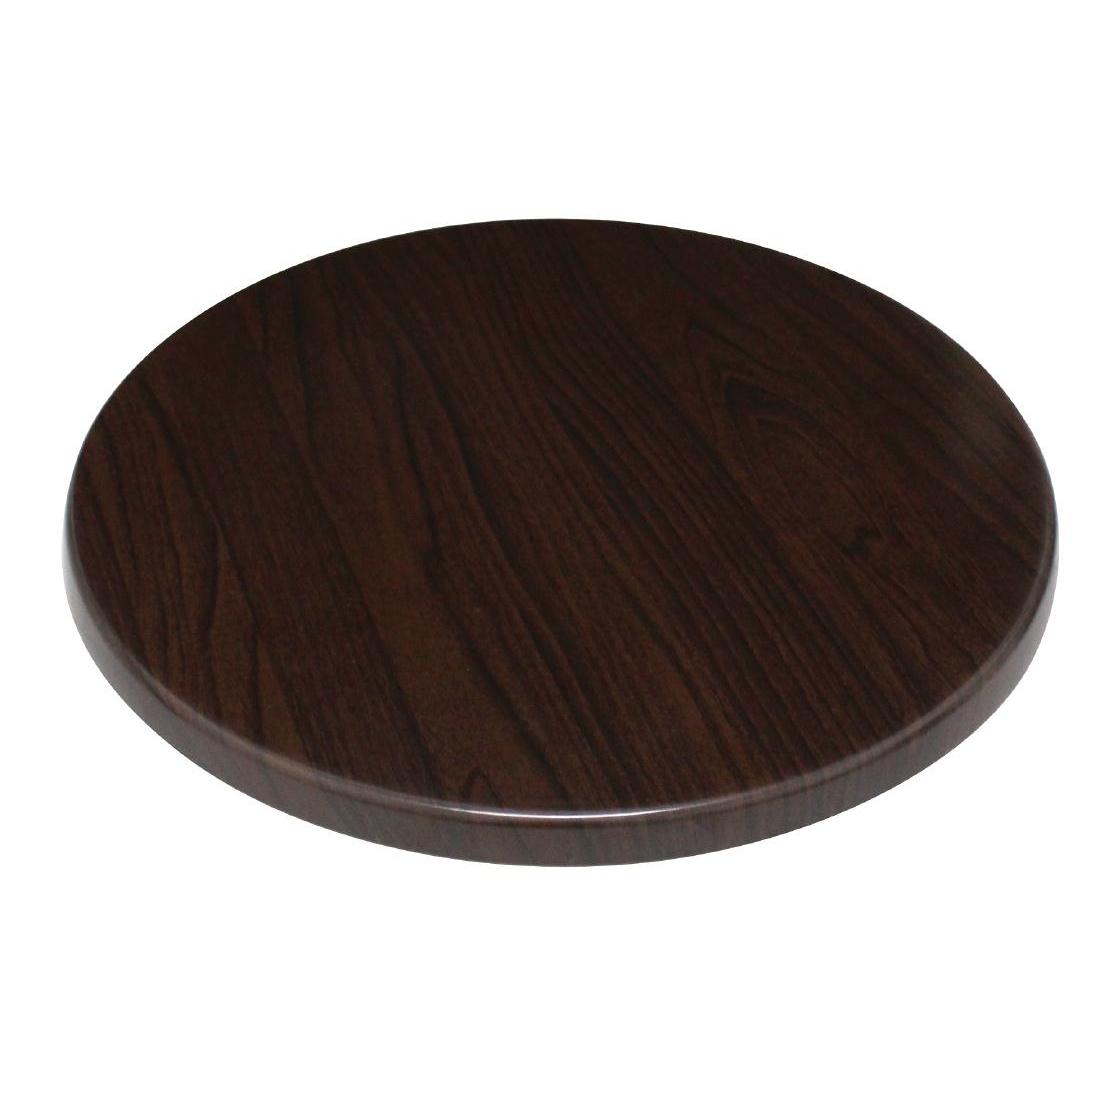 Plateau de table rond Bolero marron foncé 800mm